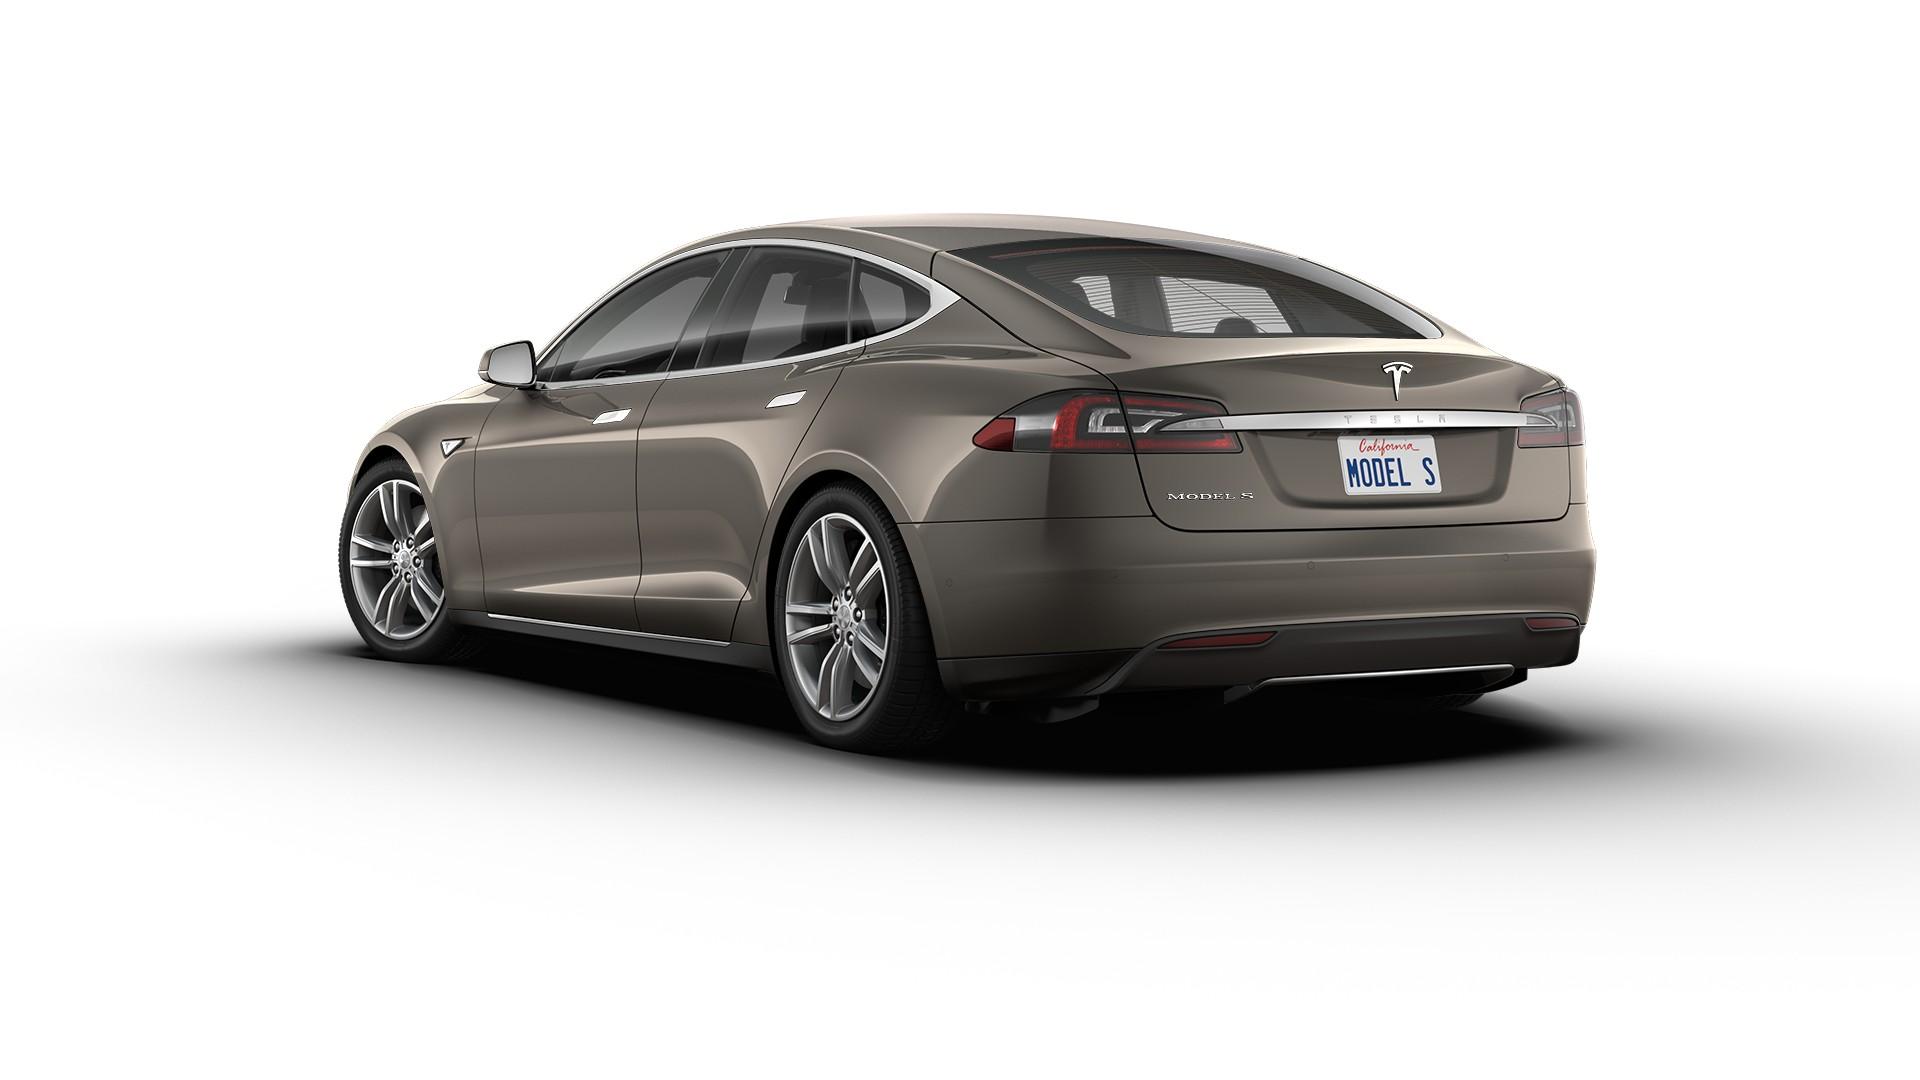 "Exterieur 19"" Wheels Silver Titanium Metallic (Warm Silver) Body Color Roof"